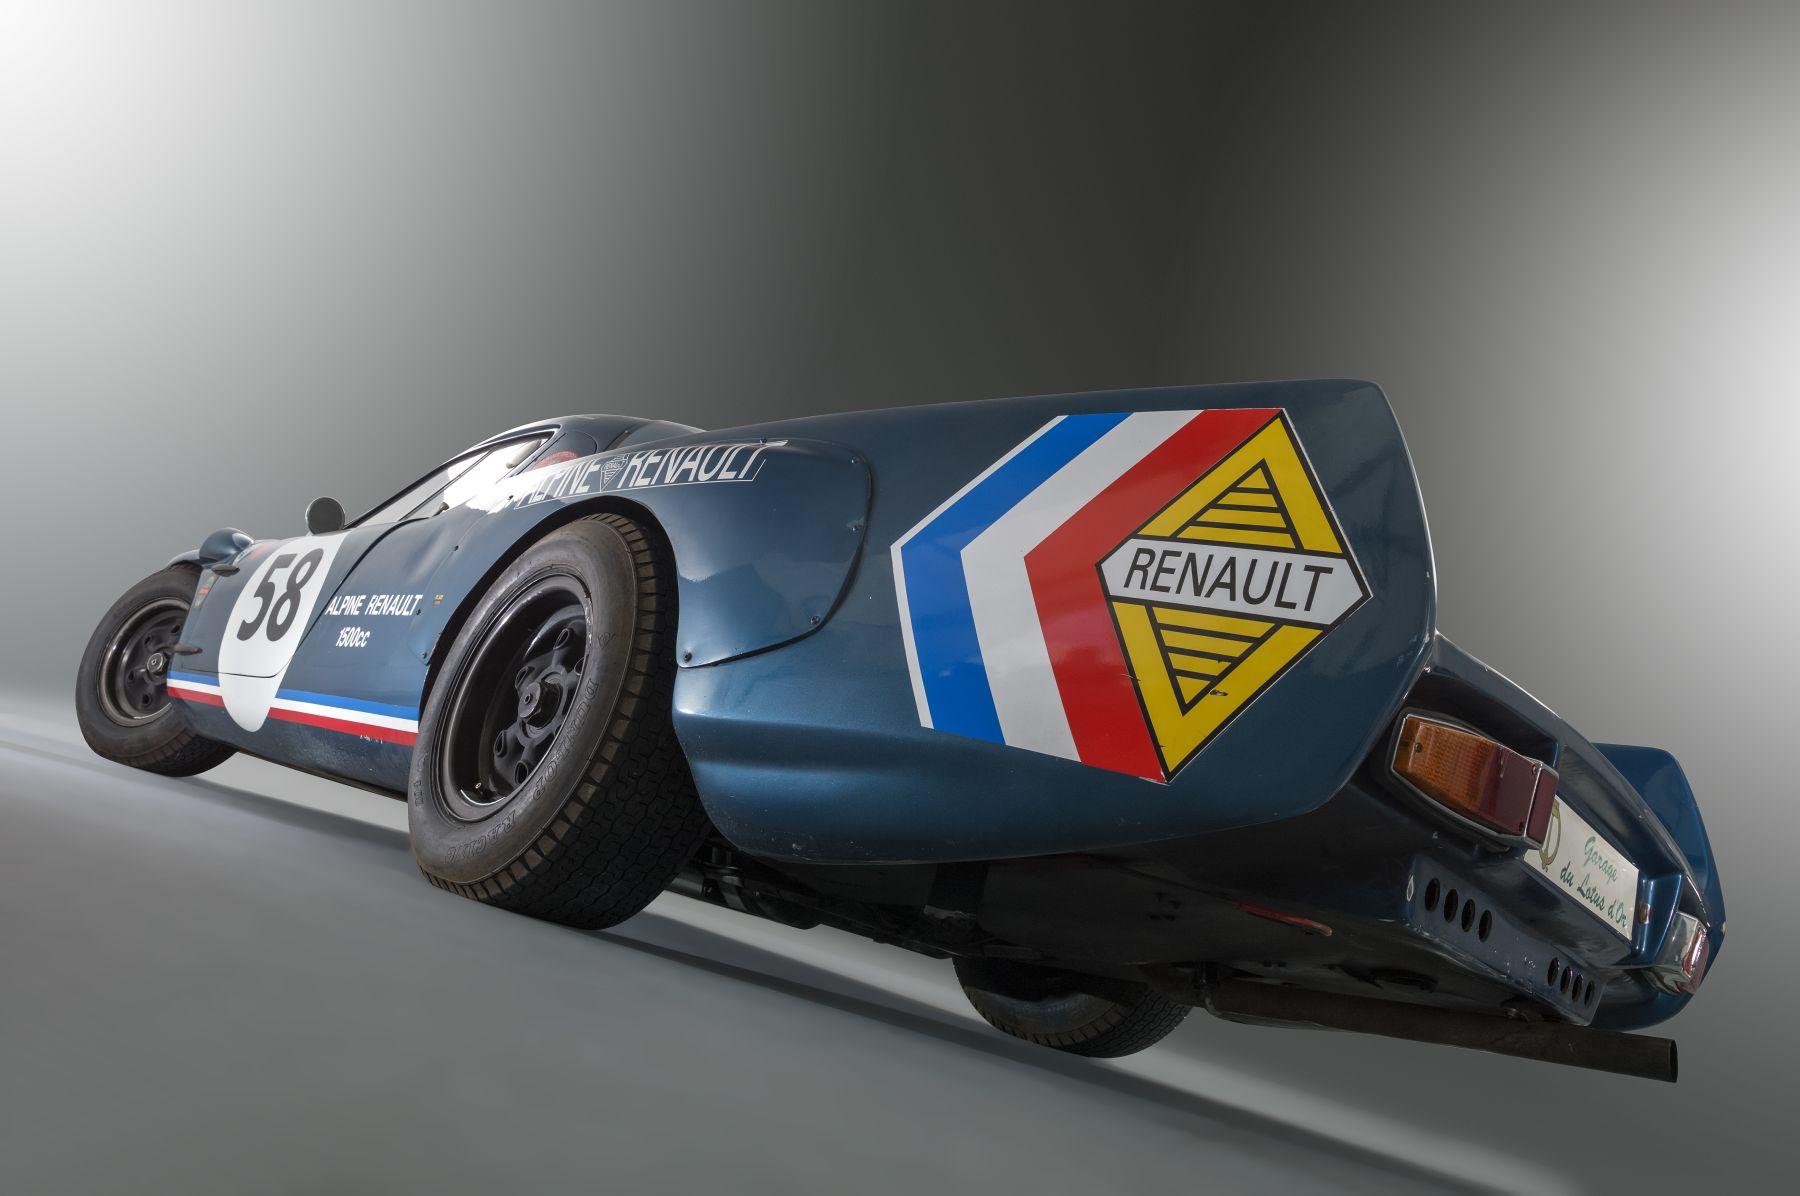 Alpine A210 Le Mans 1966 classicdriver com 20_11